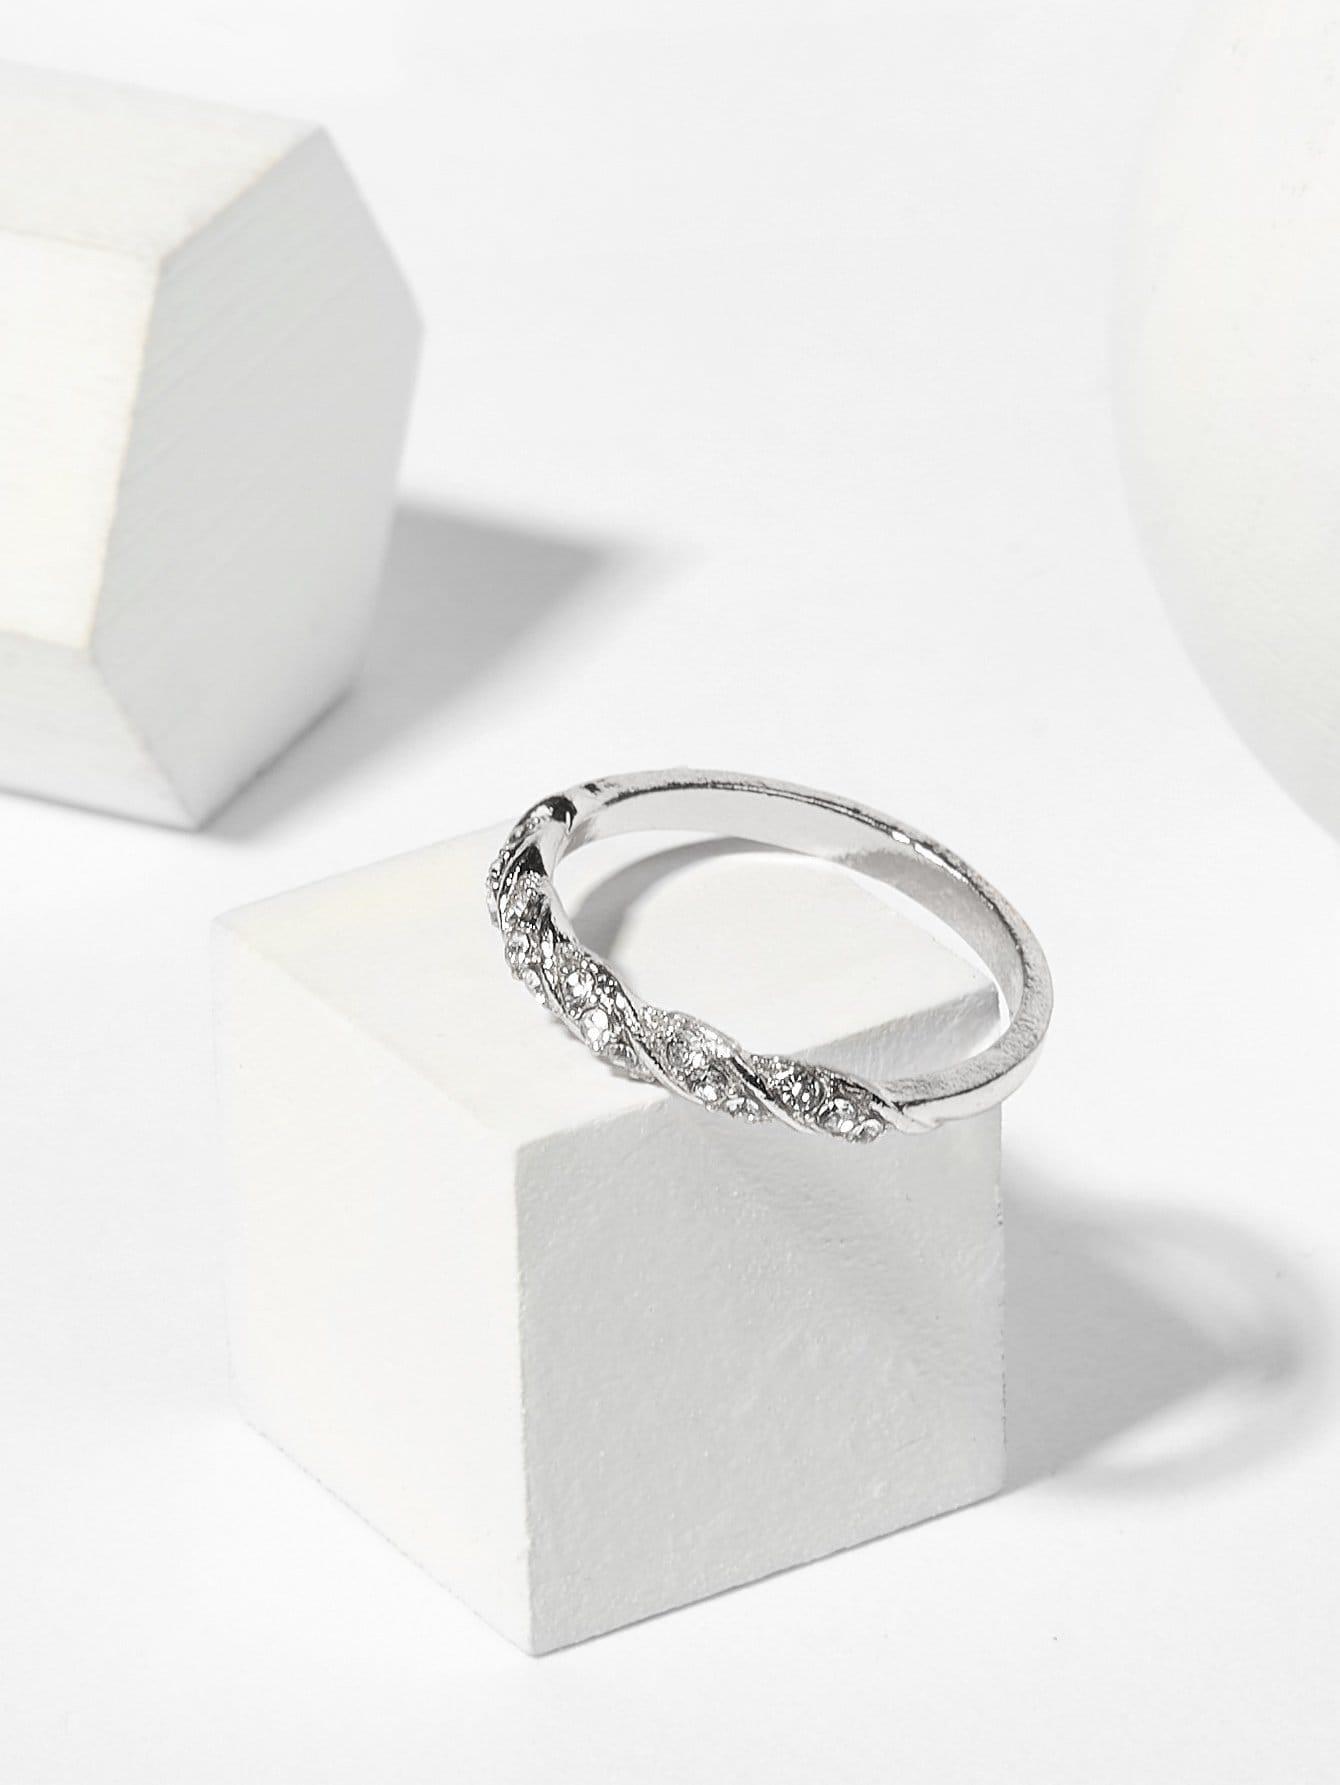 Spiral Design Rhinestone Ring